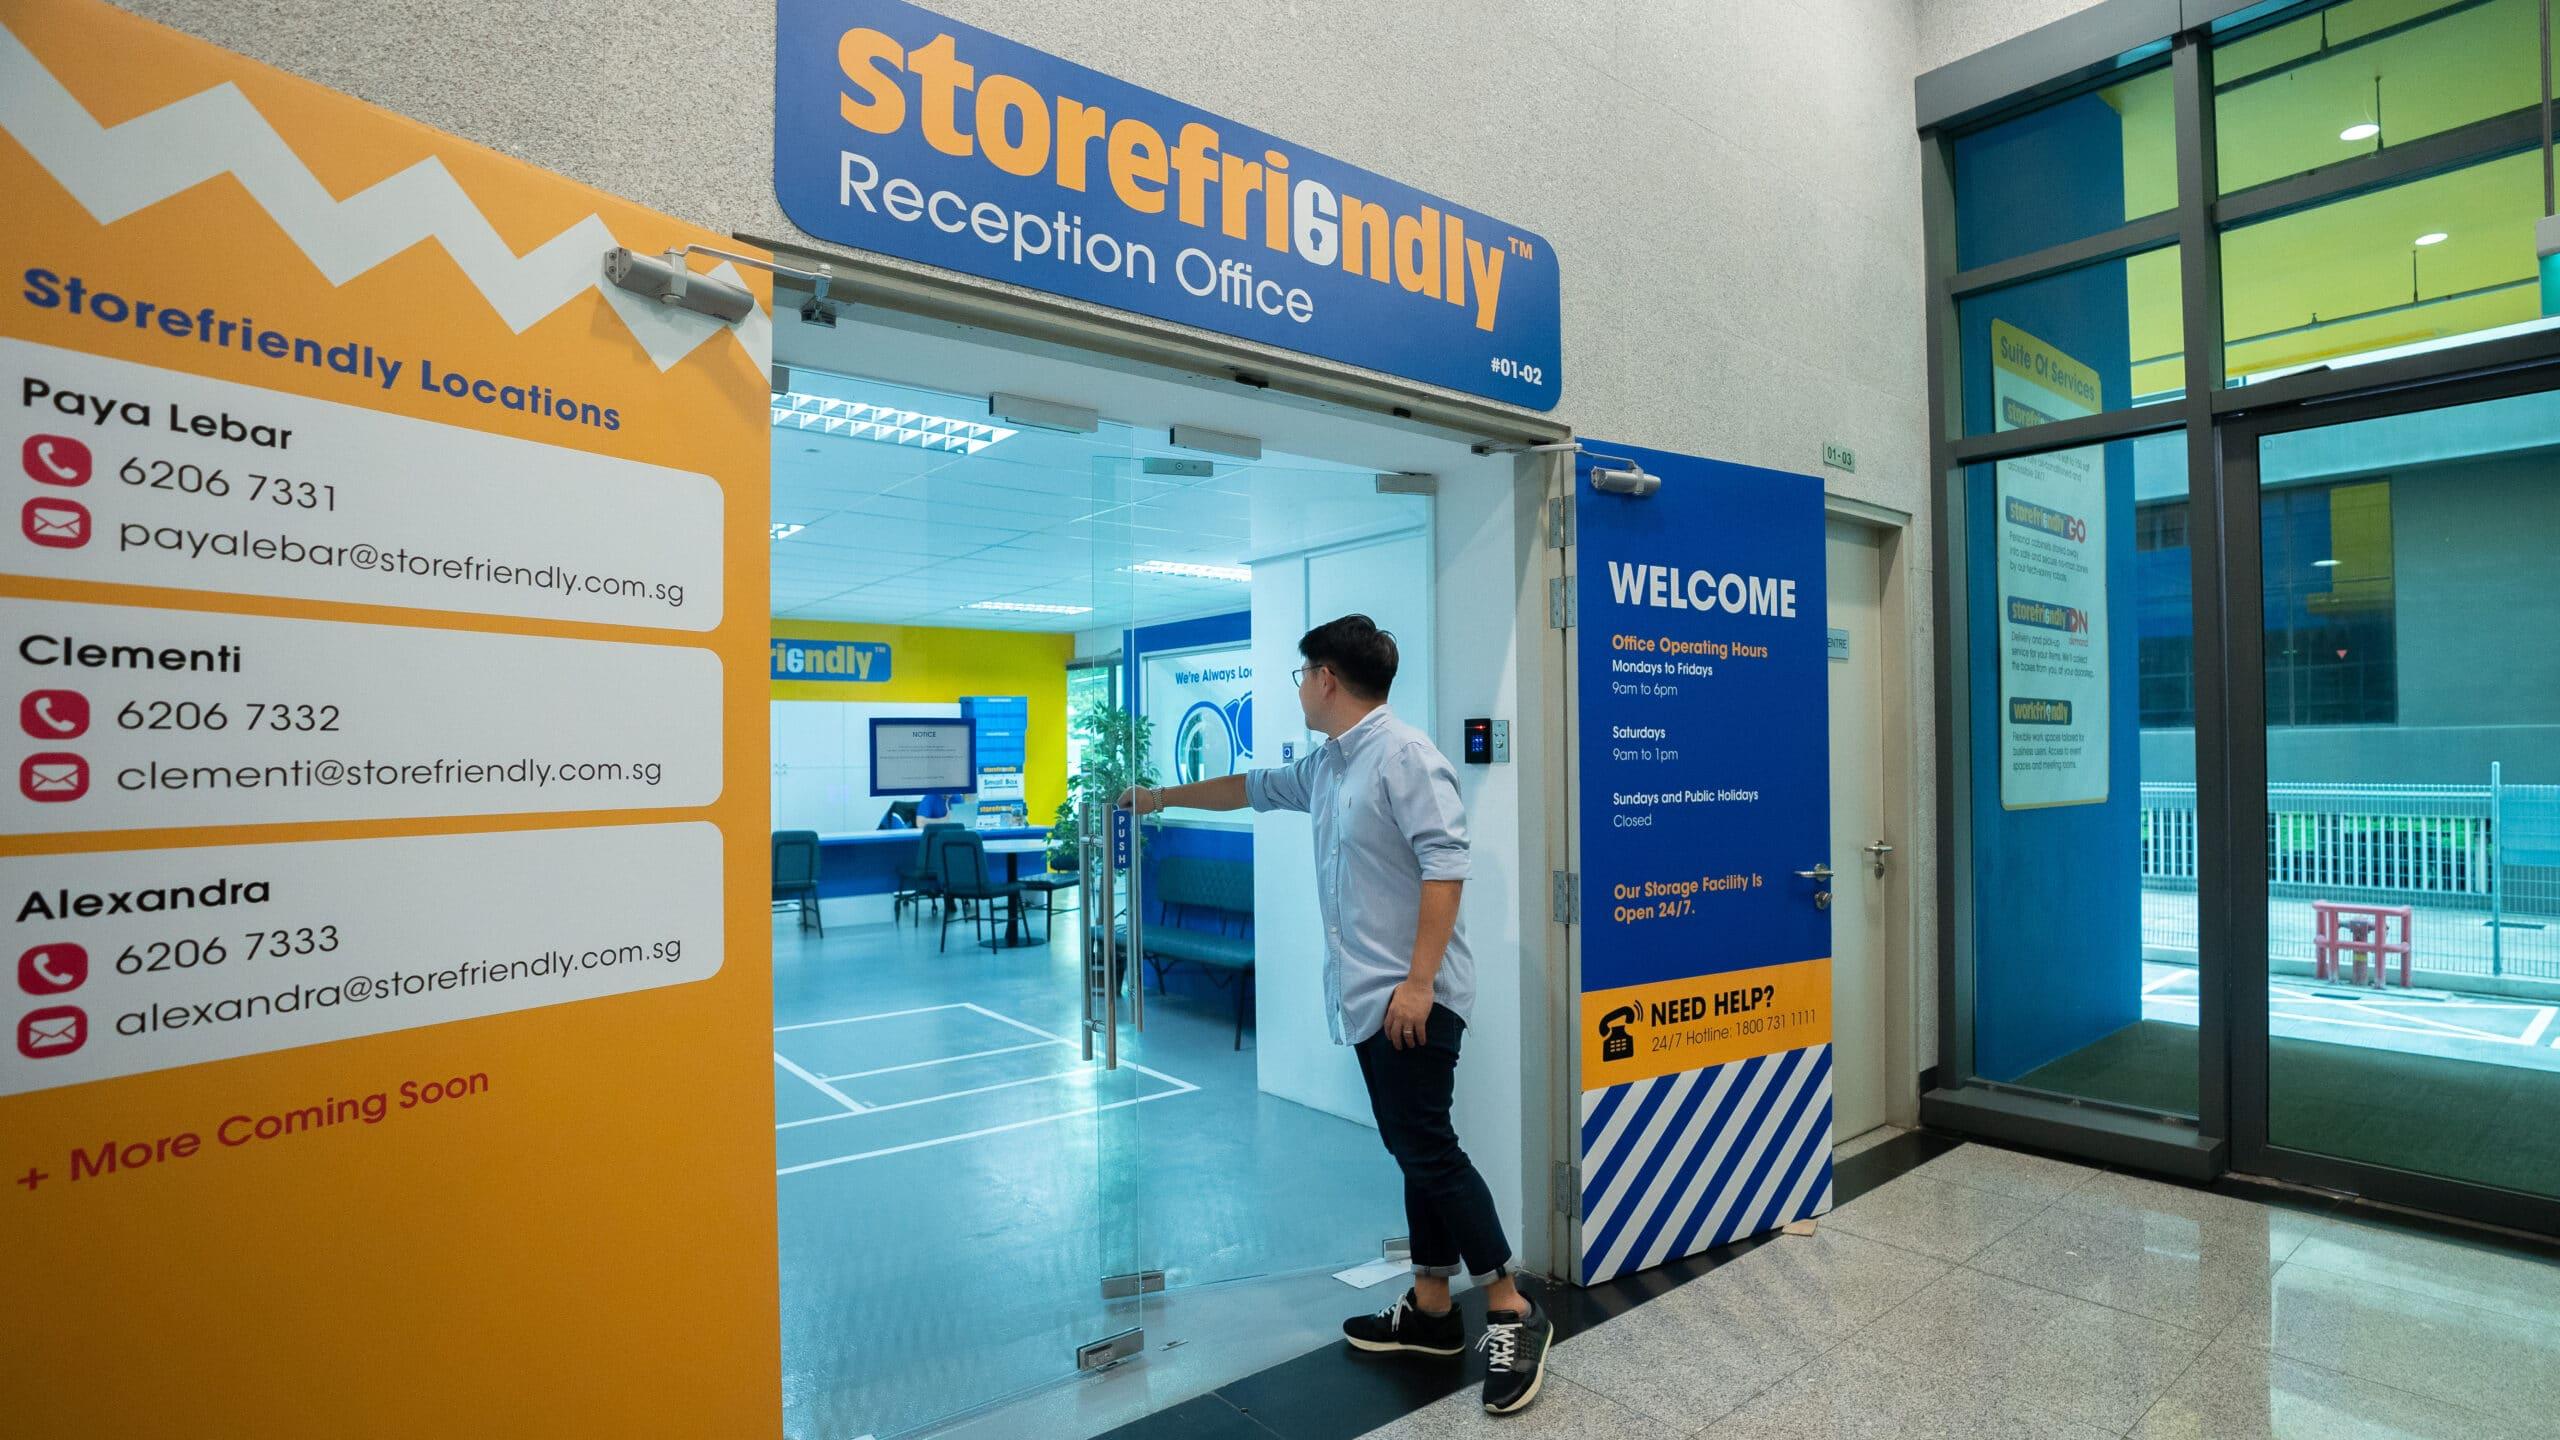 Storefriendly Paya Lebar Reception Office